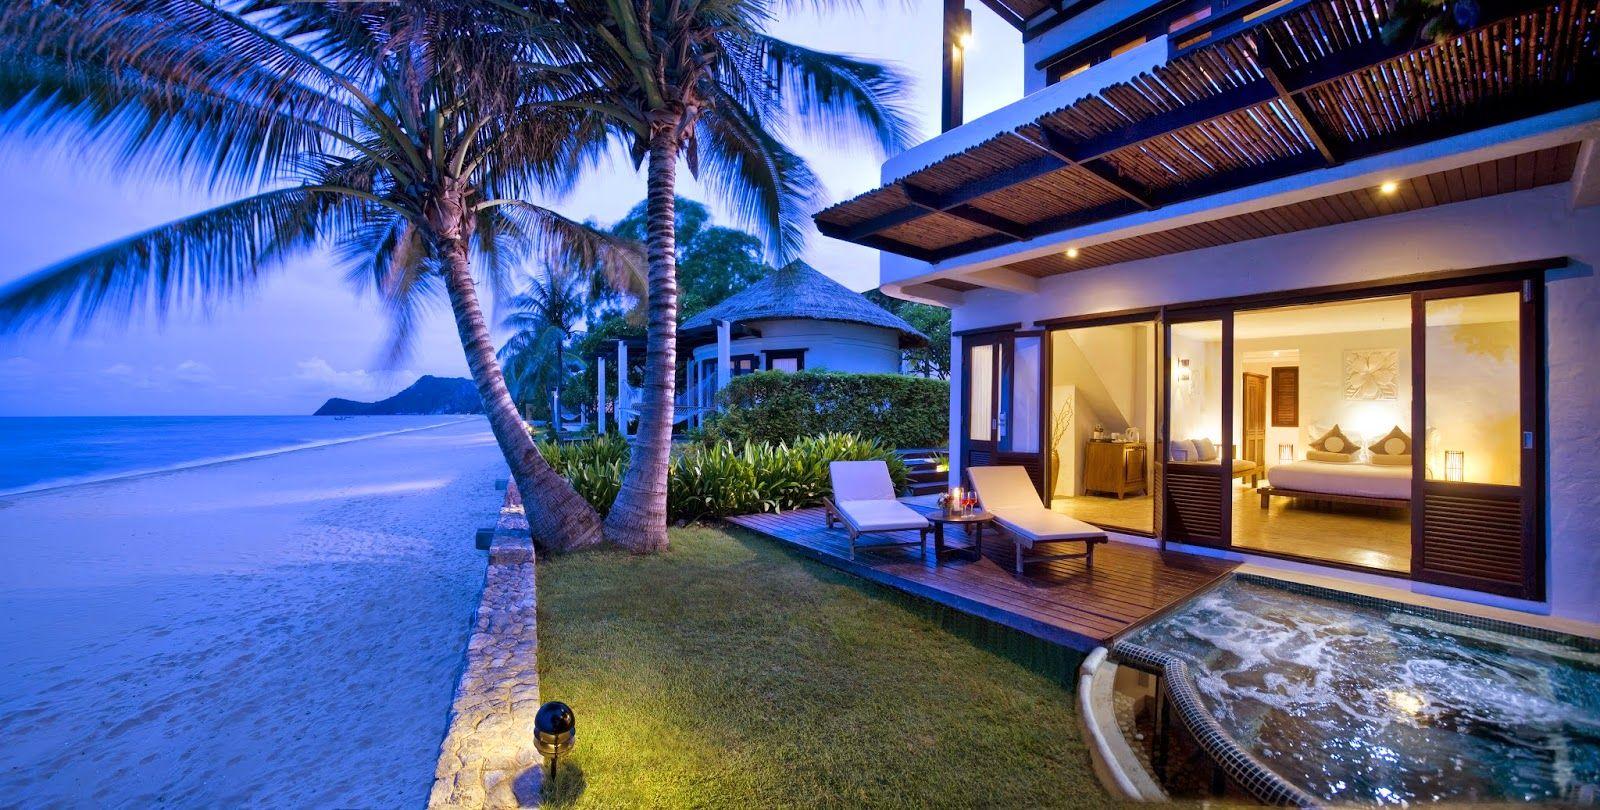 Beach House Desktop Wallpaper Luxury Beach Resorts Luxury Spa Resort Hua Hin